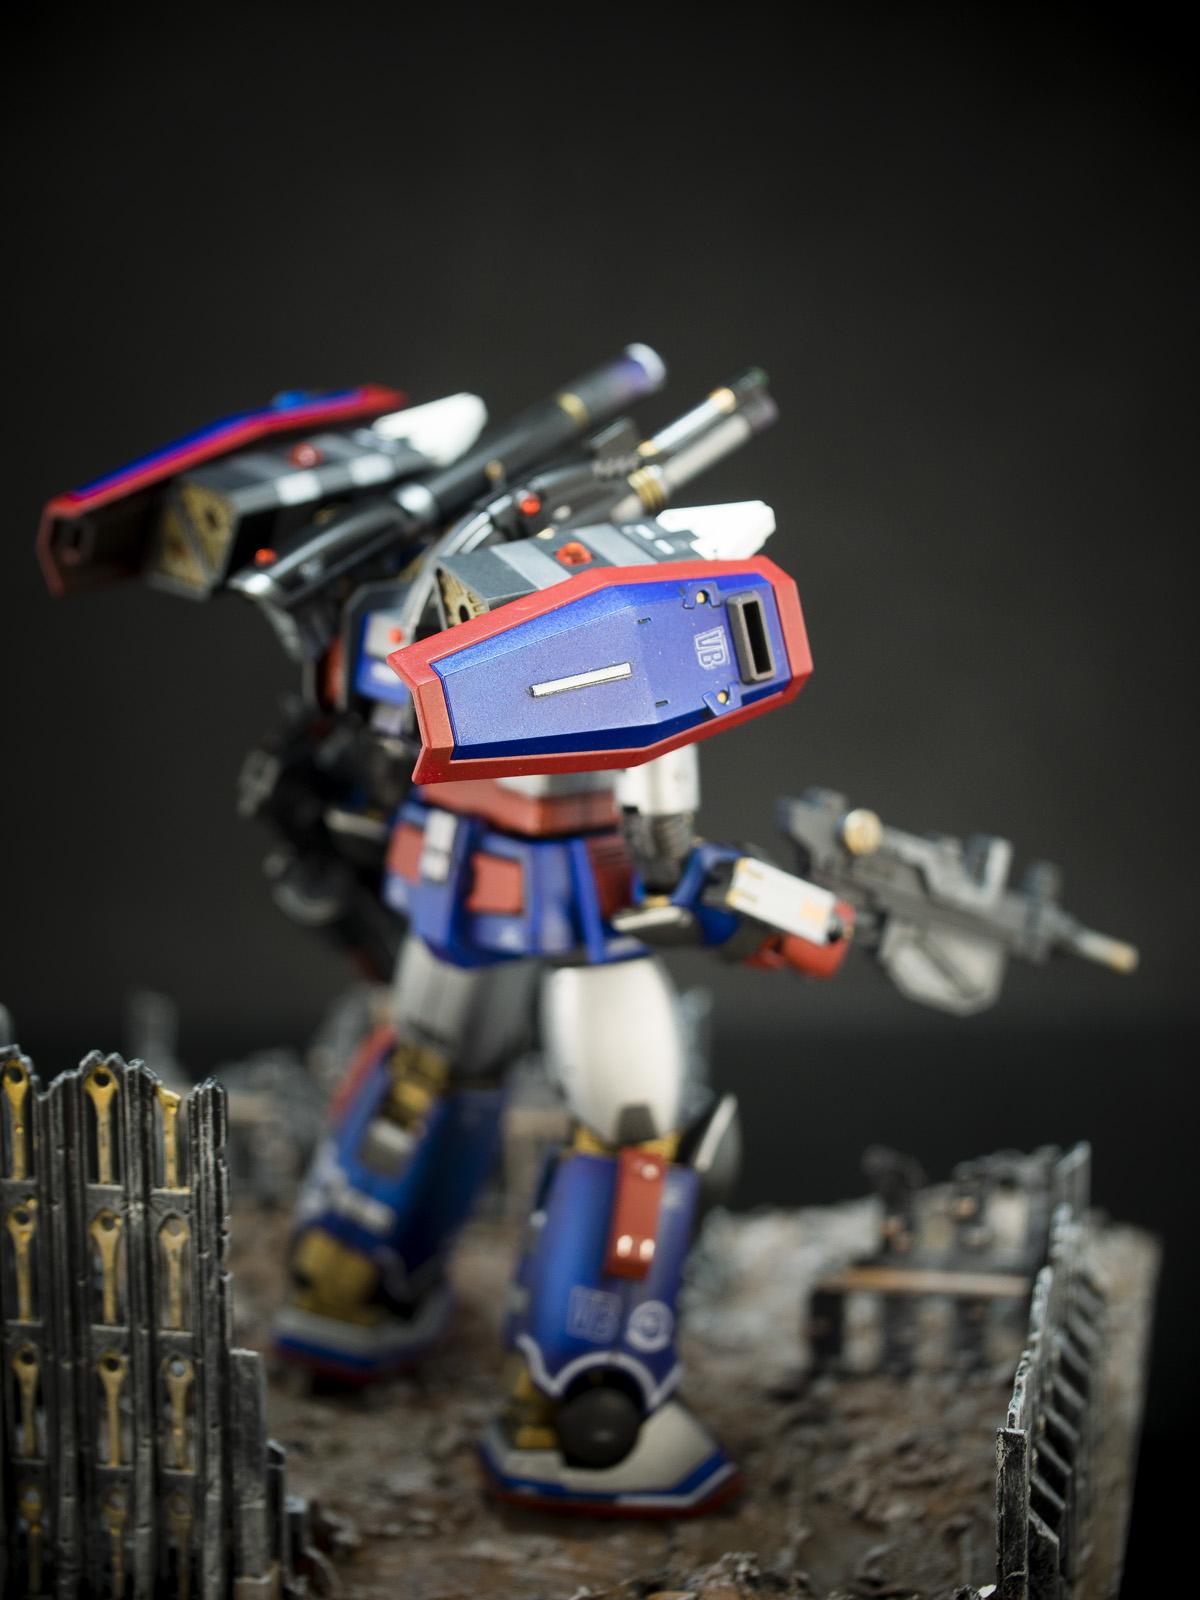 Bandai 1/144 HG RCX-76-02 Guncannon First Type [Iron Cavalry Squadron] [Iron Patriot Custom]